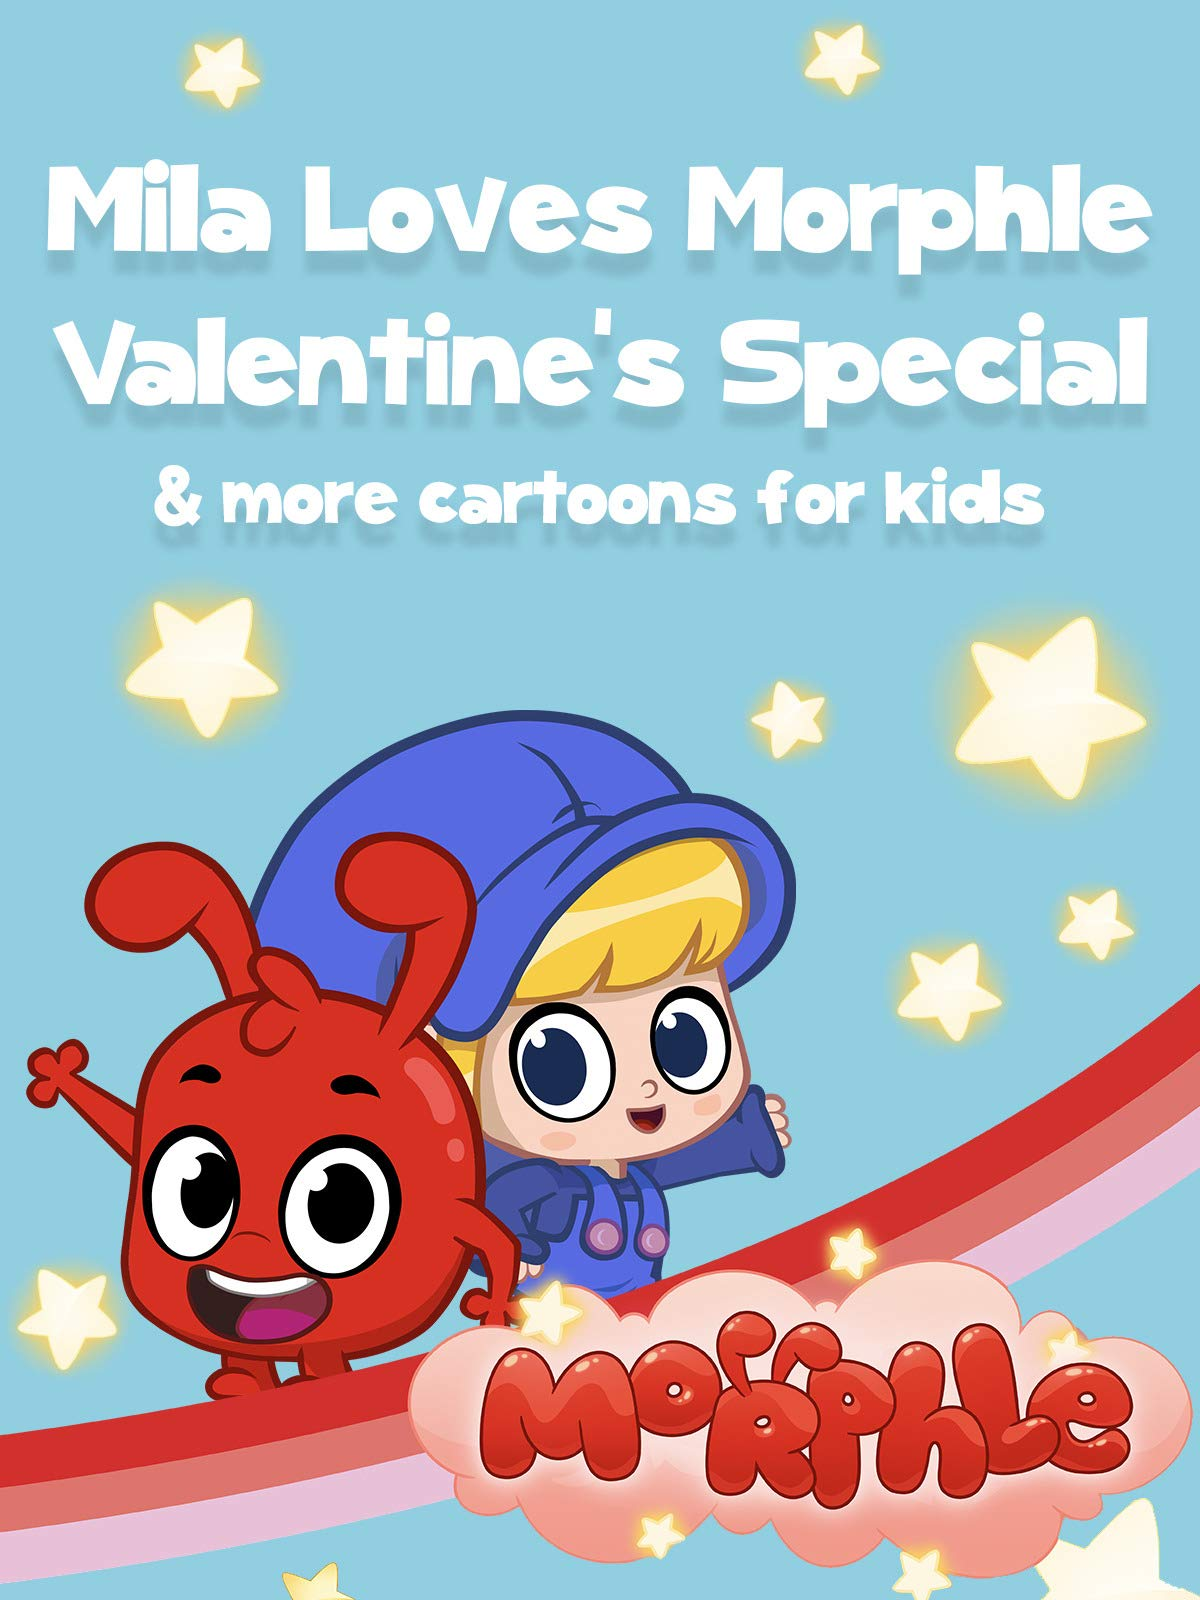 Morphle - Mila Loves Morphle Valentine's Special - & more cartoons for kids on Amazon Prime Video UK